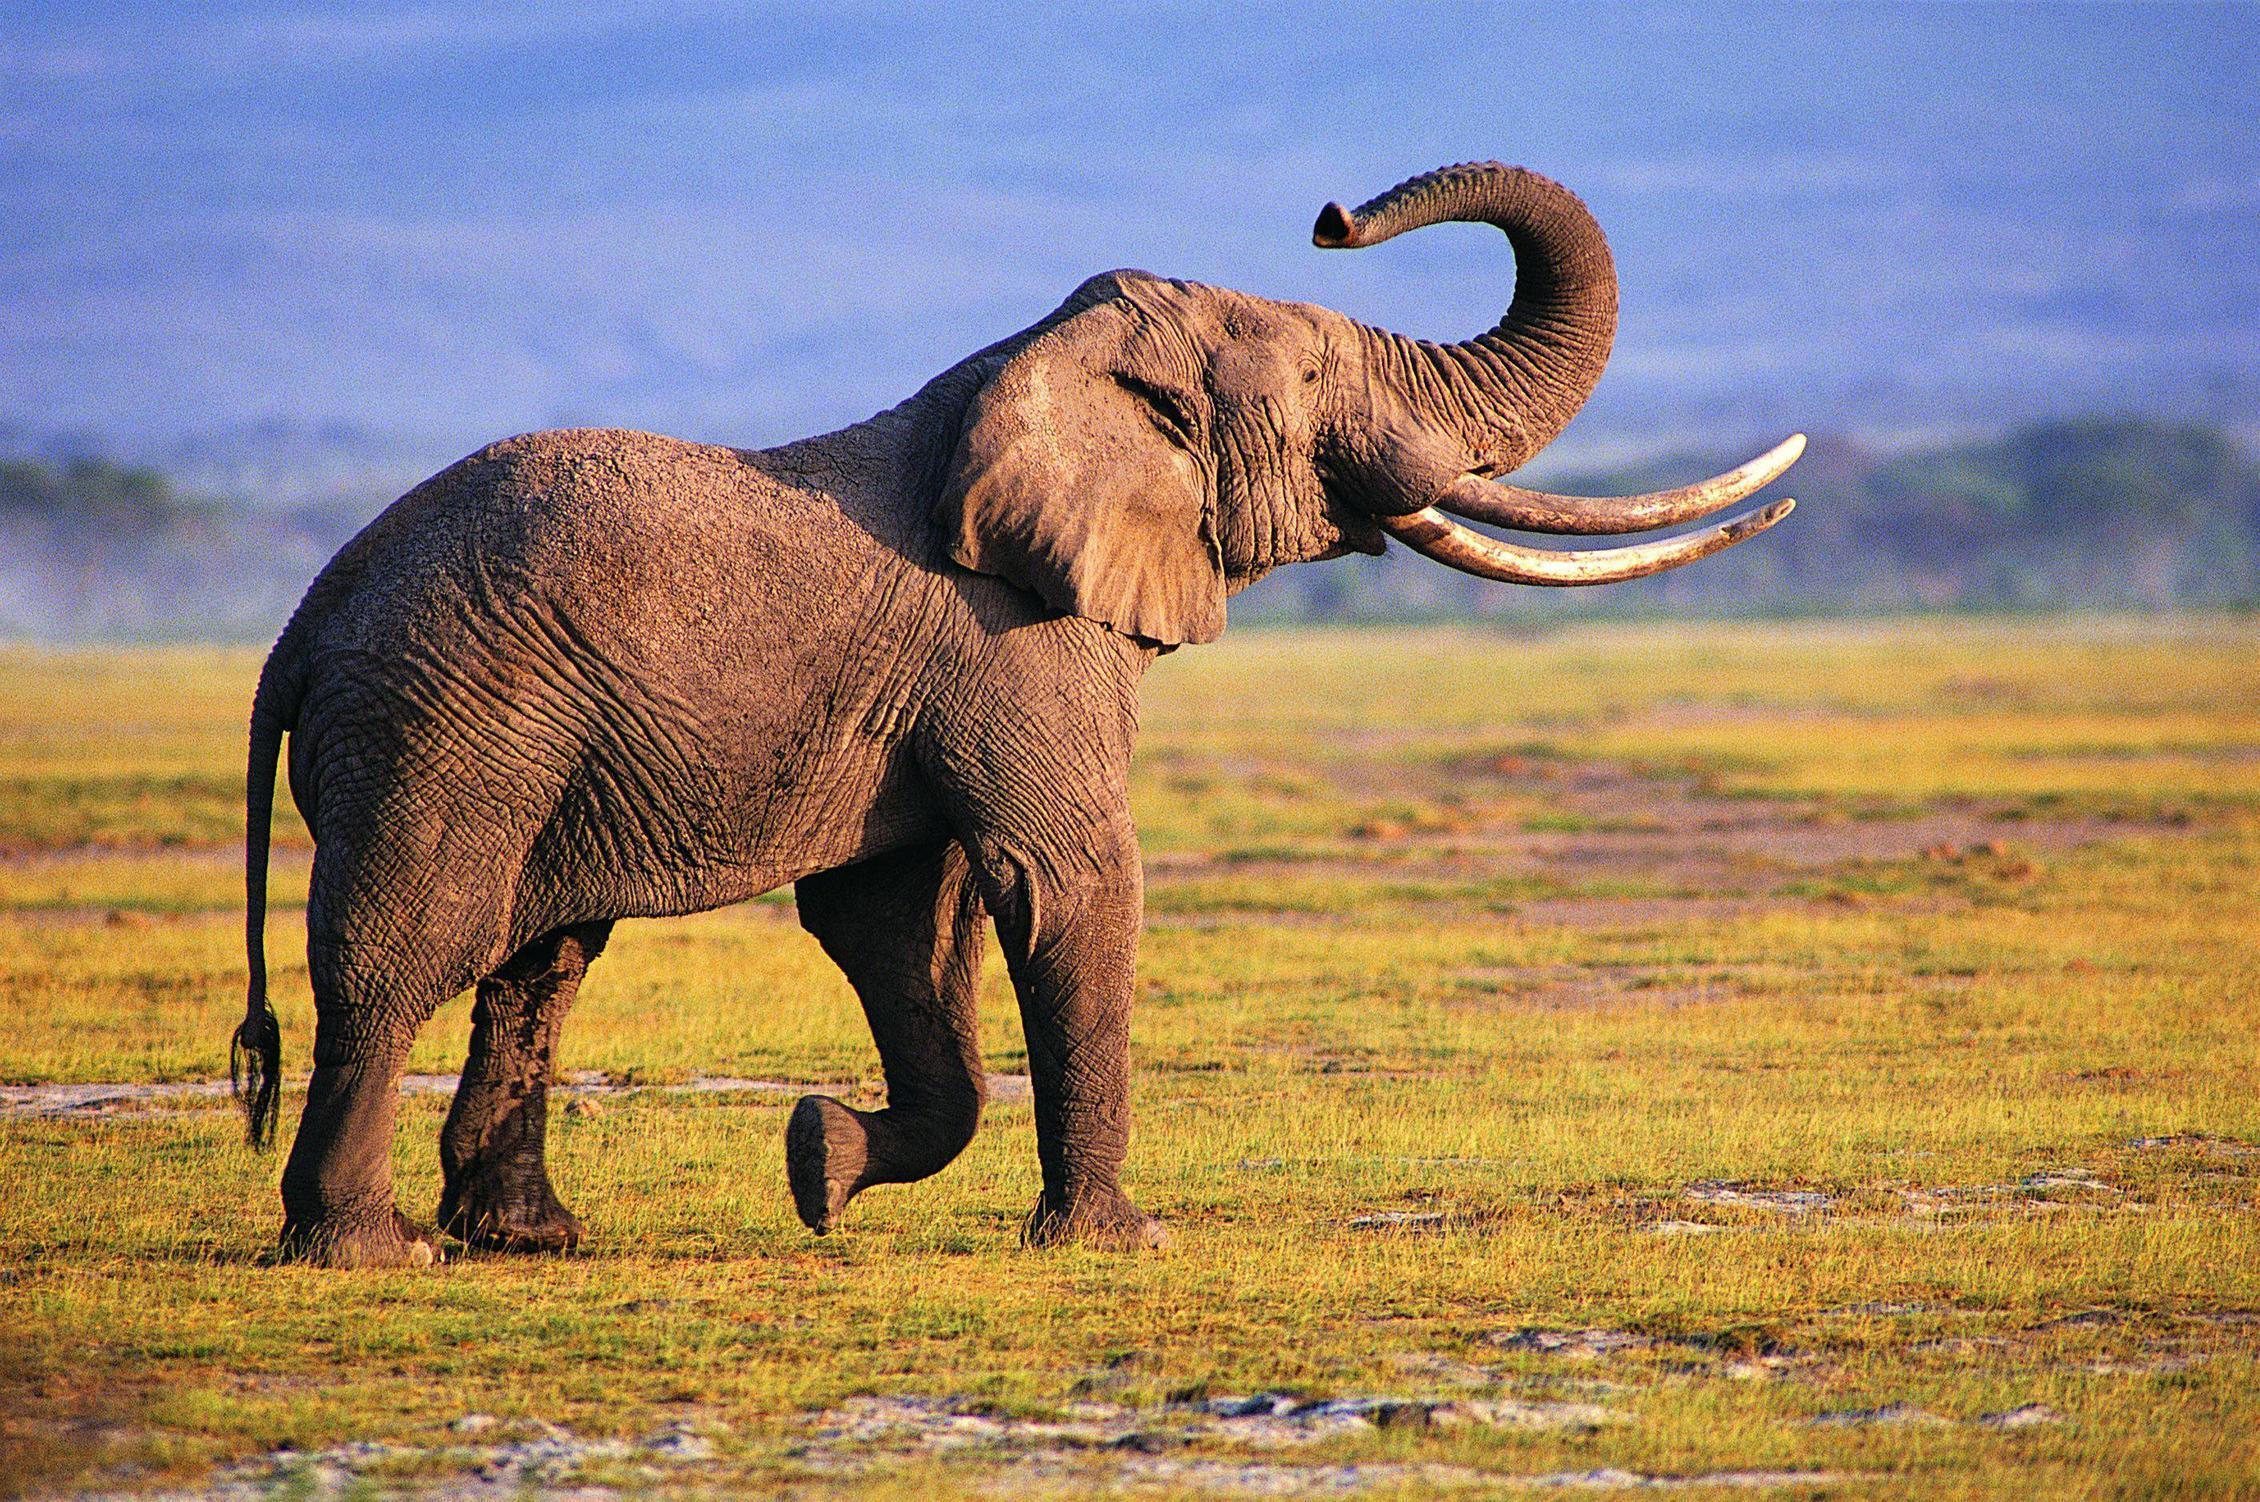 Wallpaper download elephant - Elephant Desktop Wallpaper Elephant Pictures New Wallpapers Download